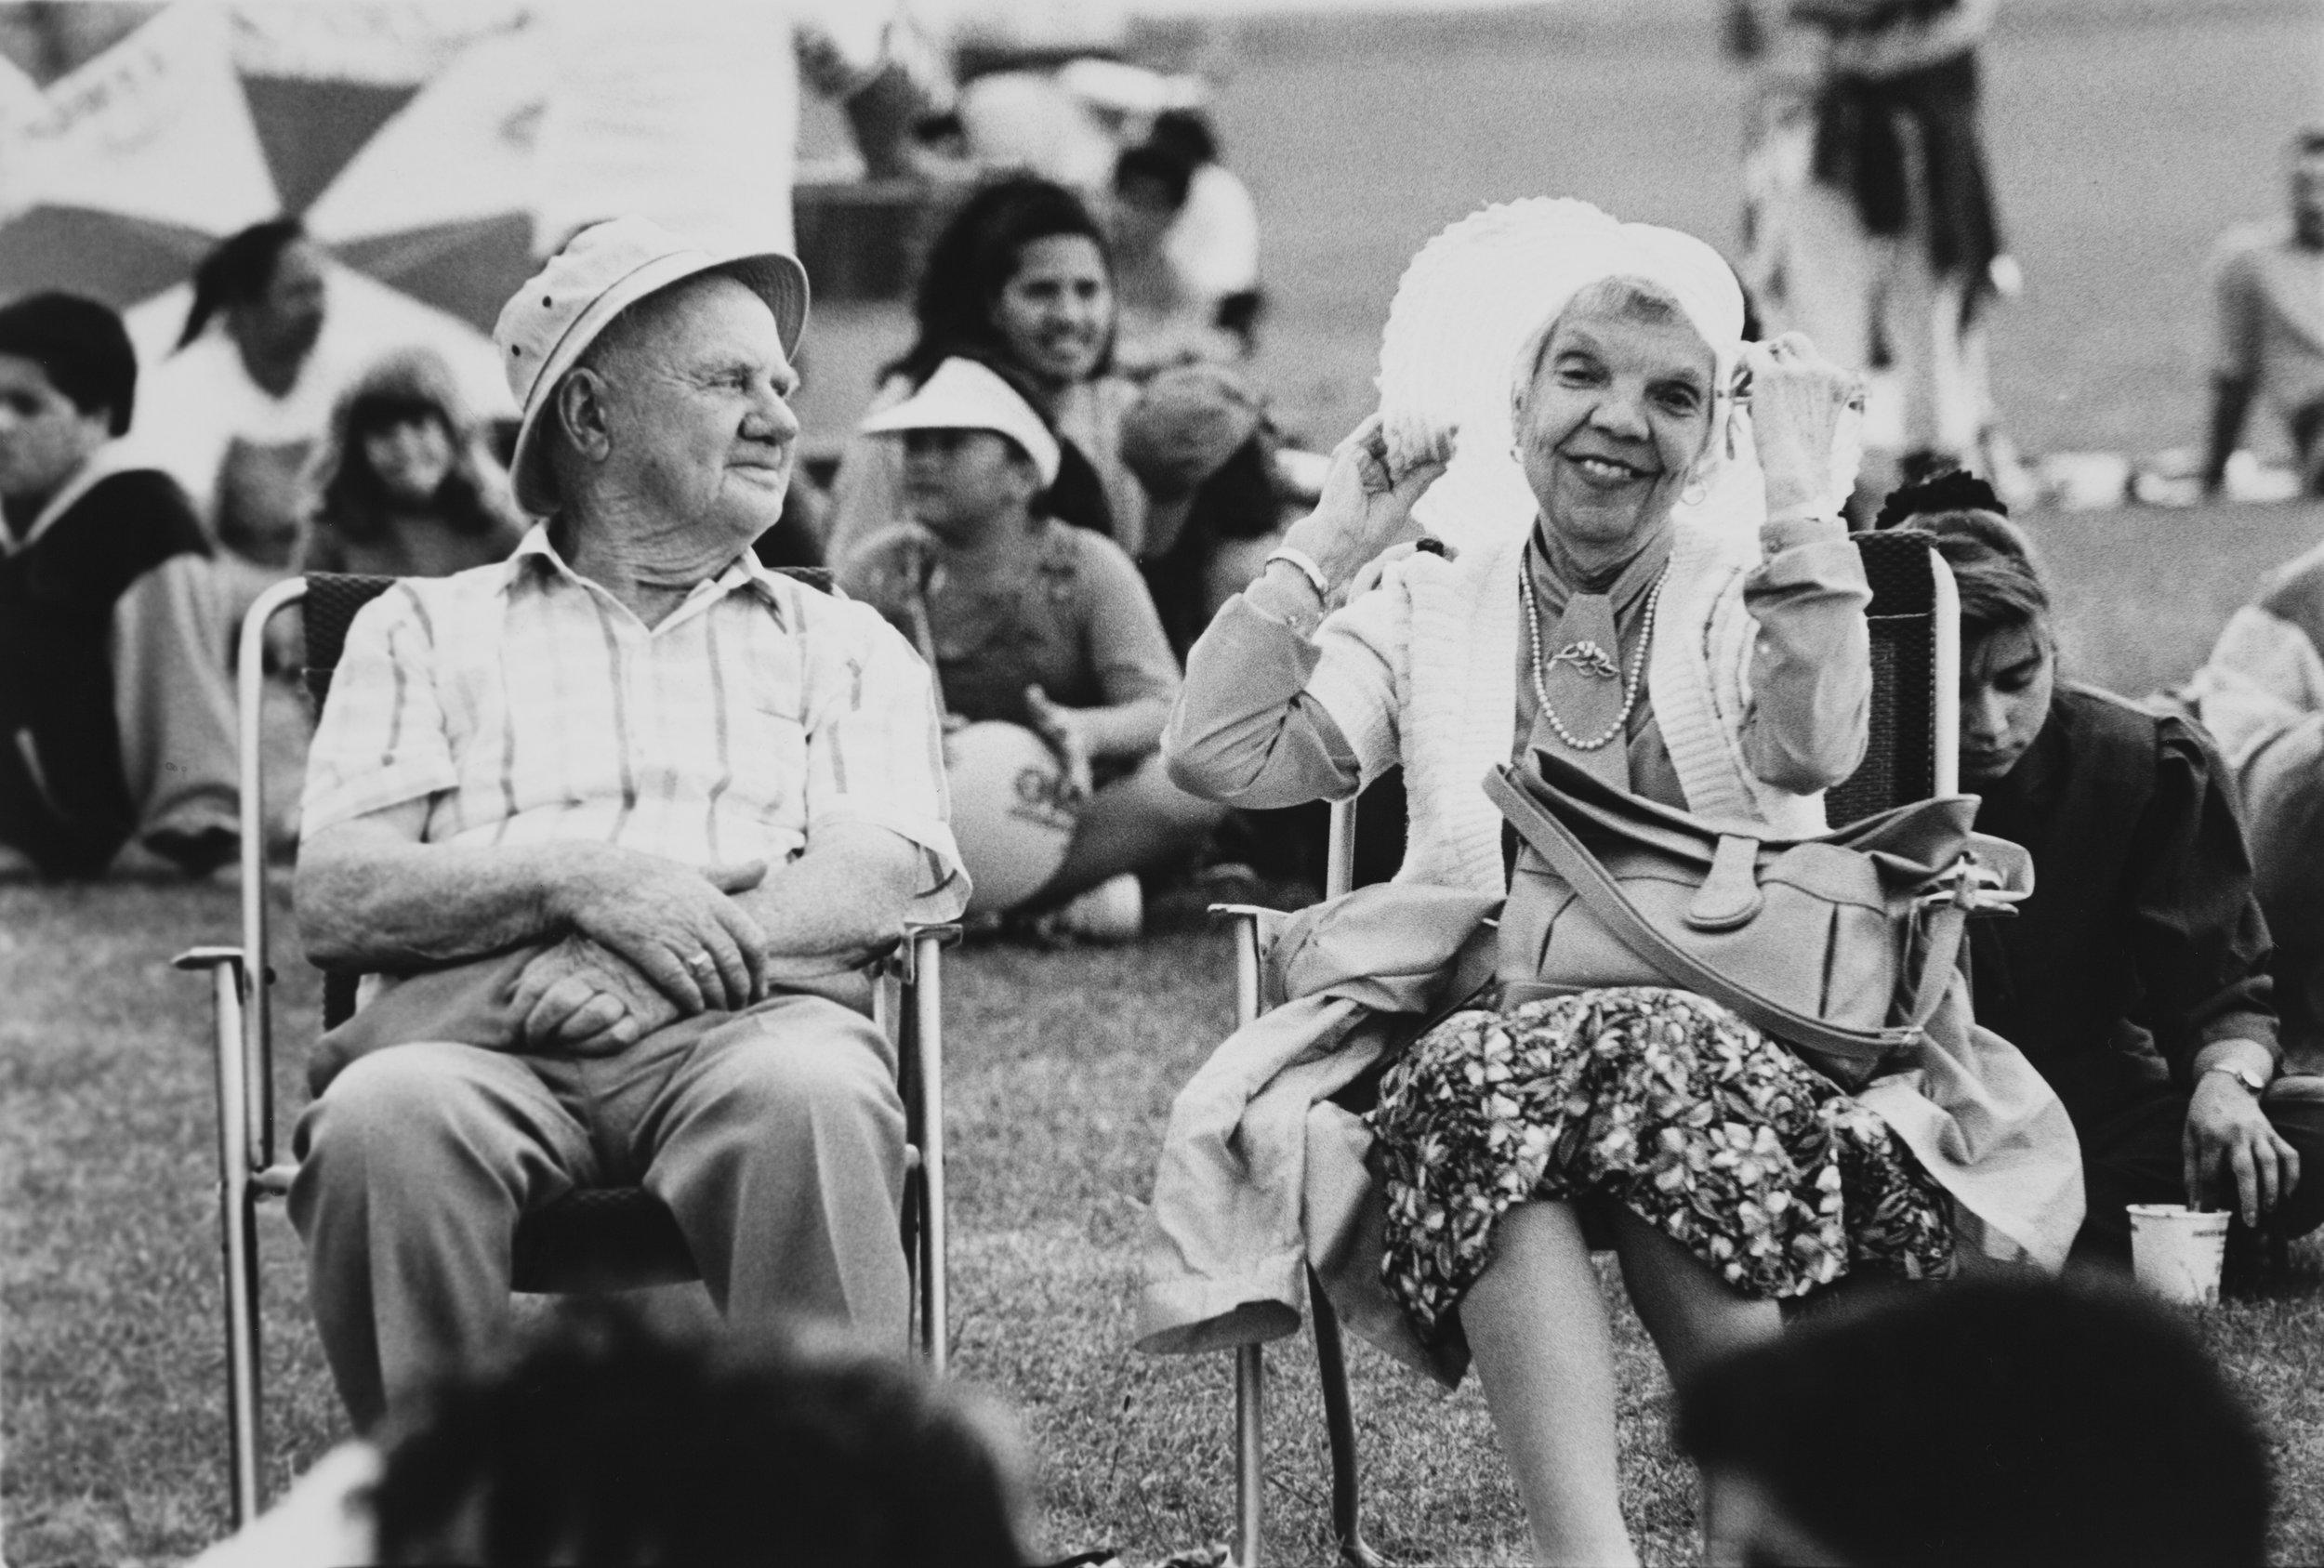 Festival comforts', Manukau City Centre, 1994. Creator: Unknown. Date: 3 December 1994. Footprints 03631